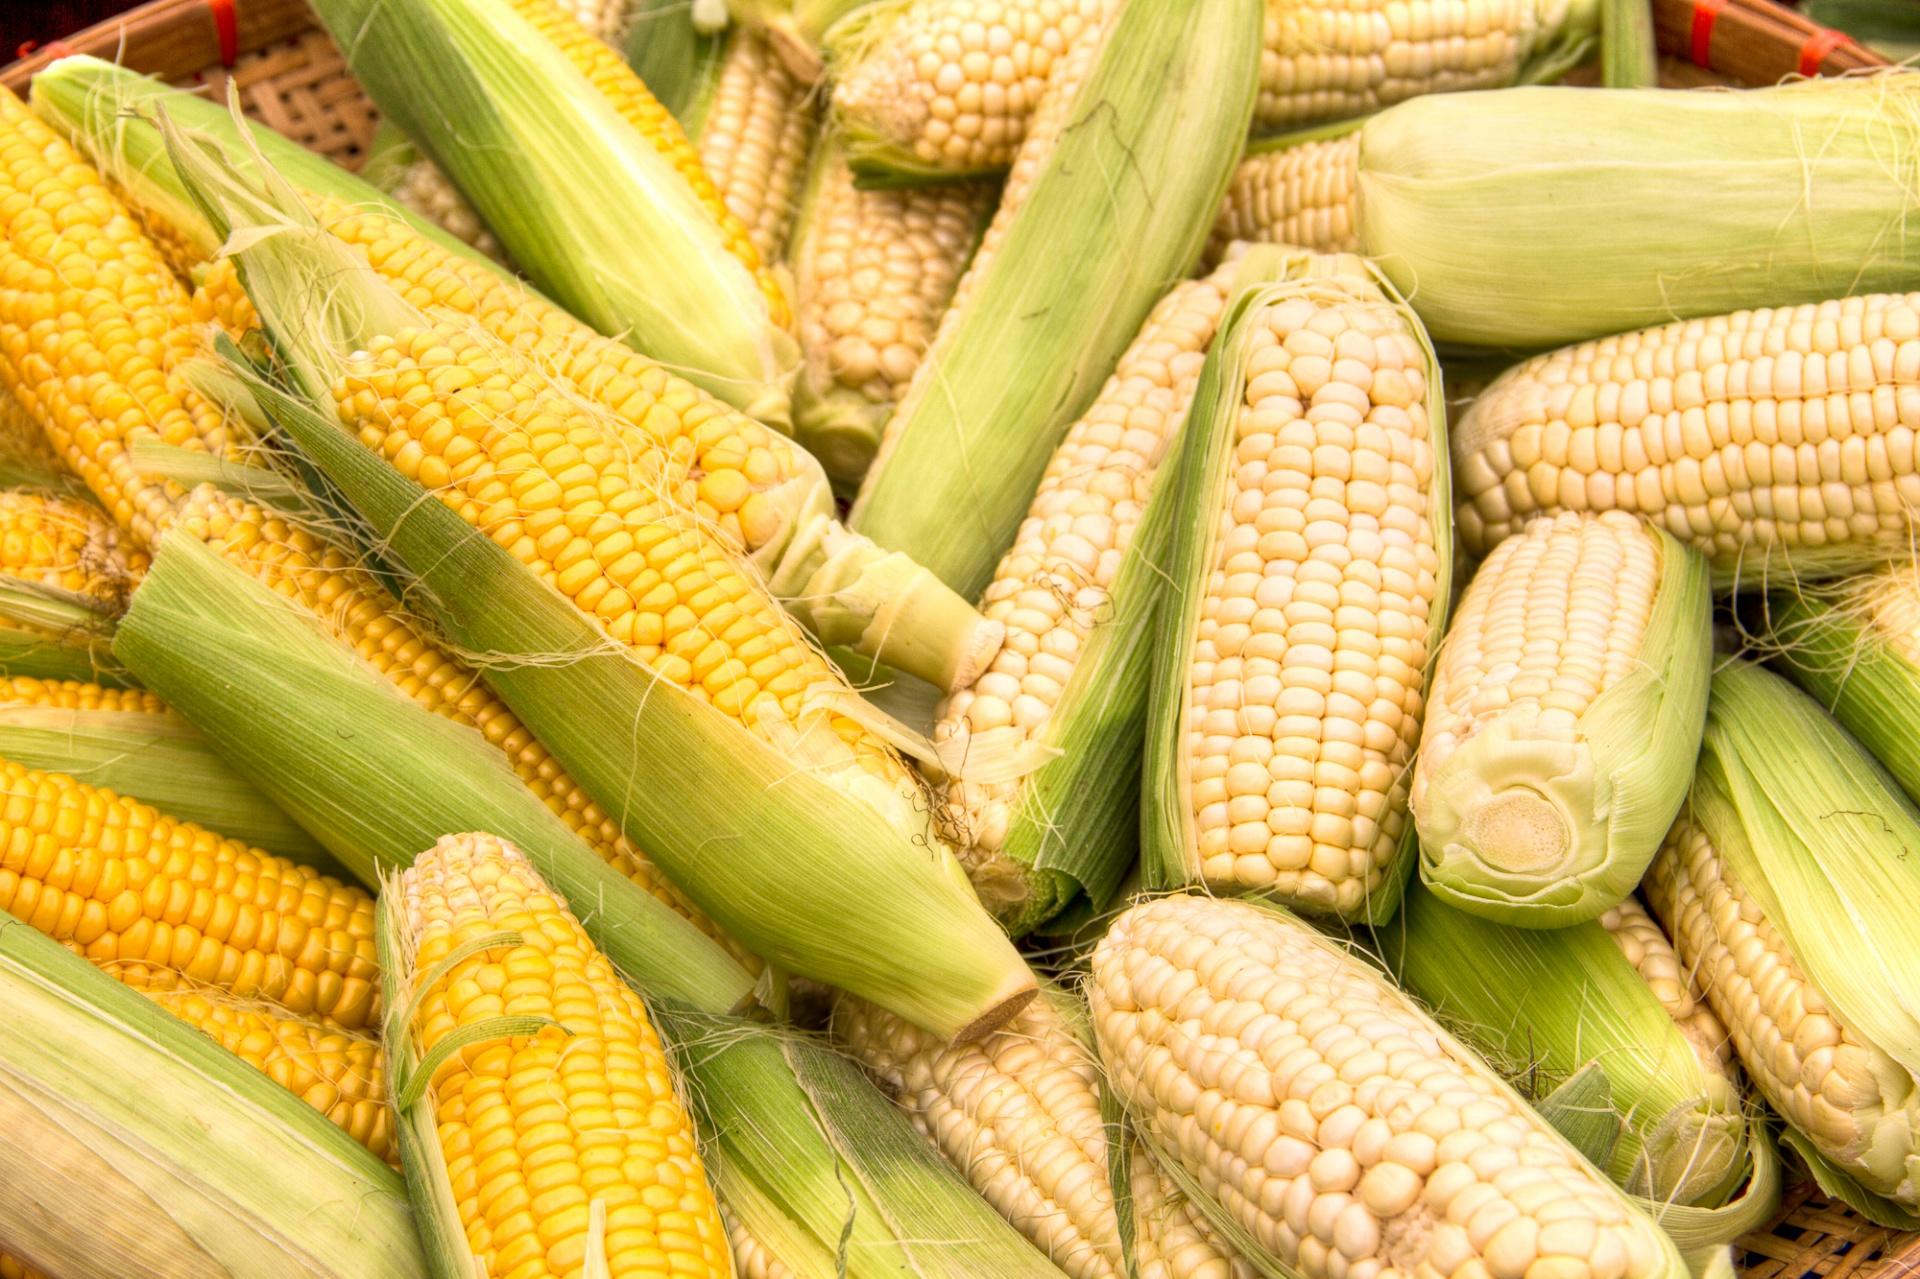 corn-on-the-cob-1509755892fme.jpg